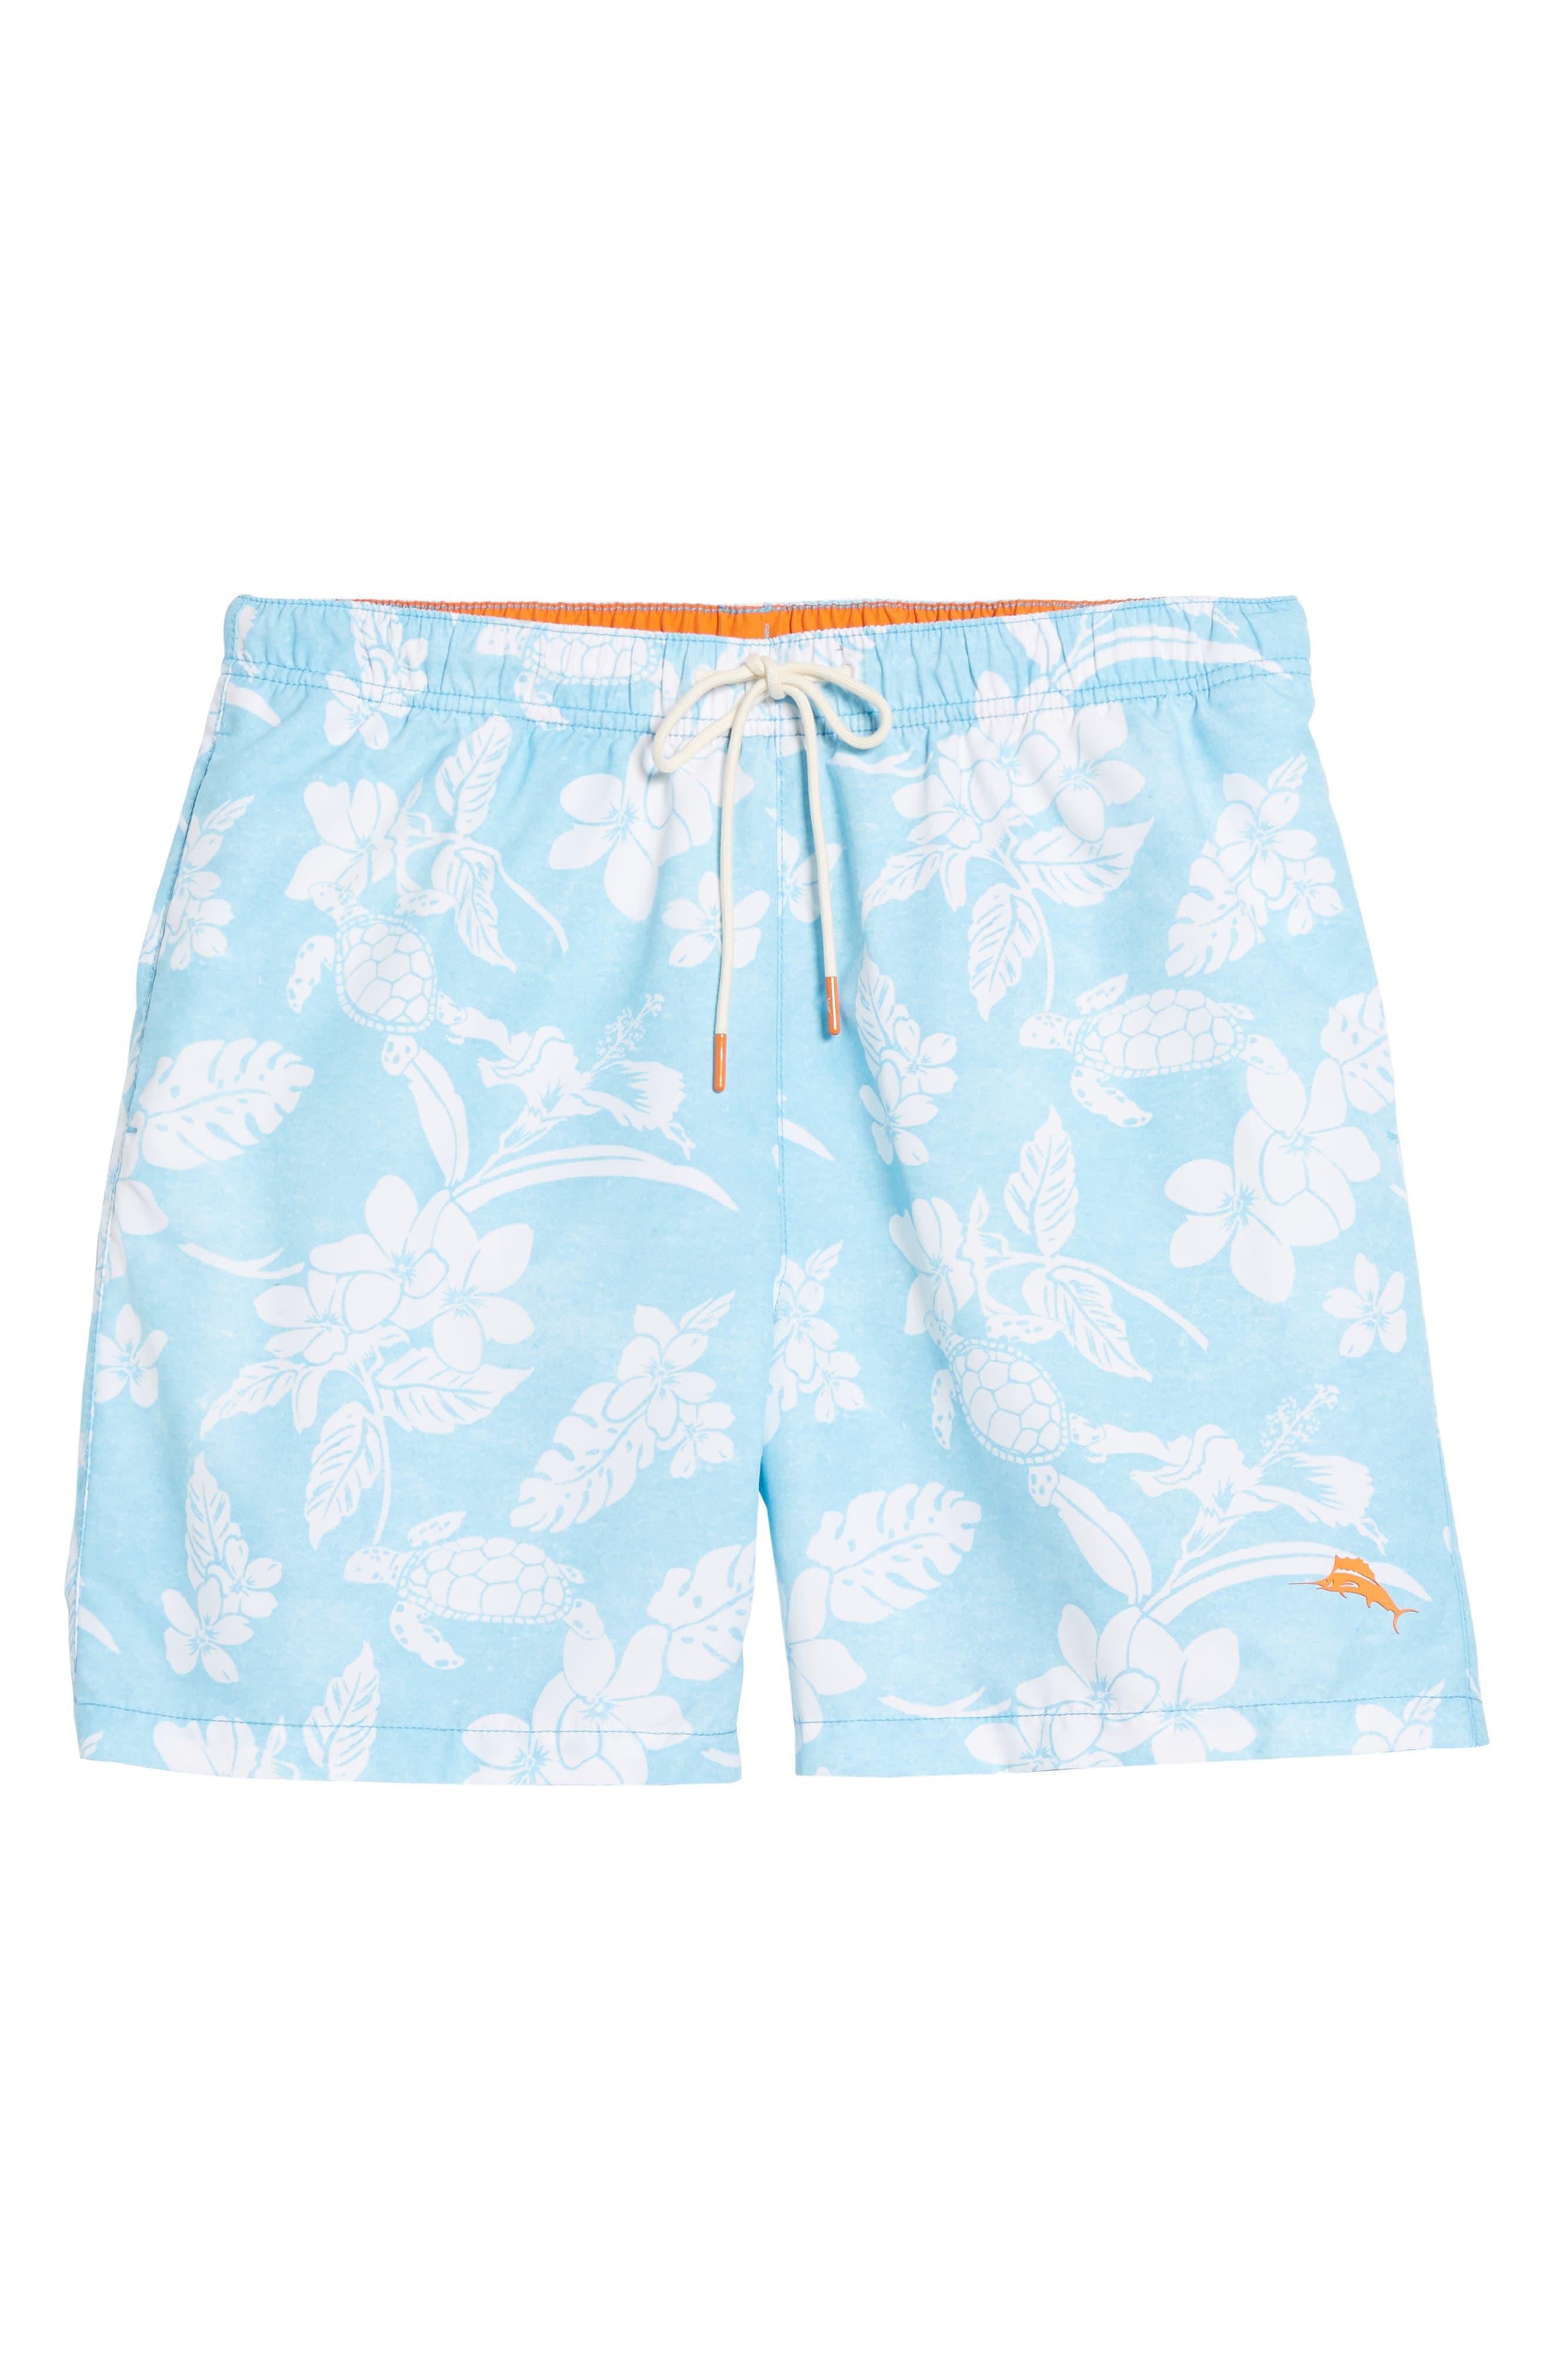 Naples Turtle Beach Swim Trunks,                             Alternate thumbnail 6, color,                             Breeze Blue